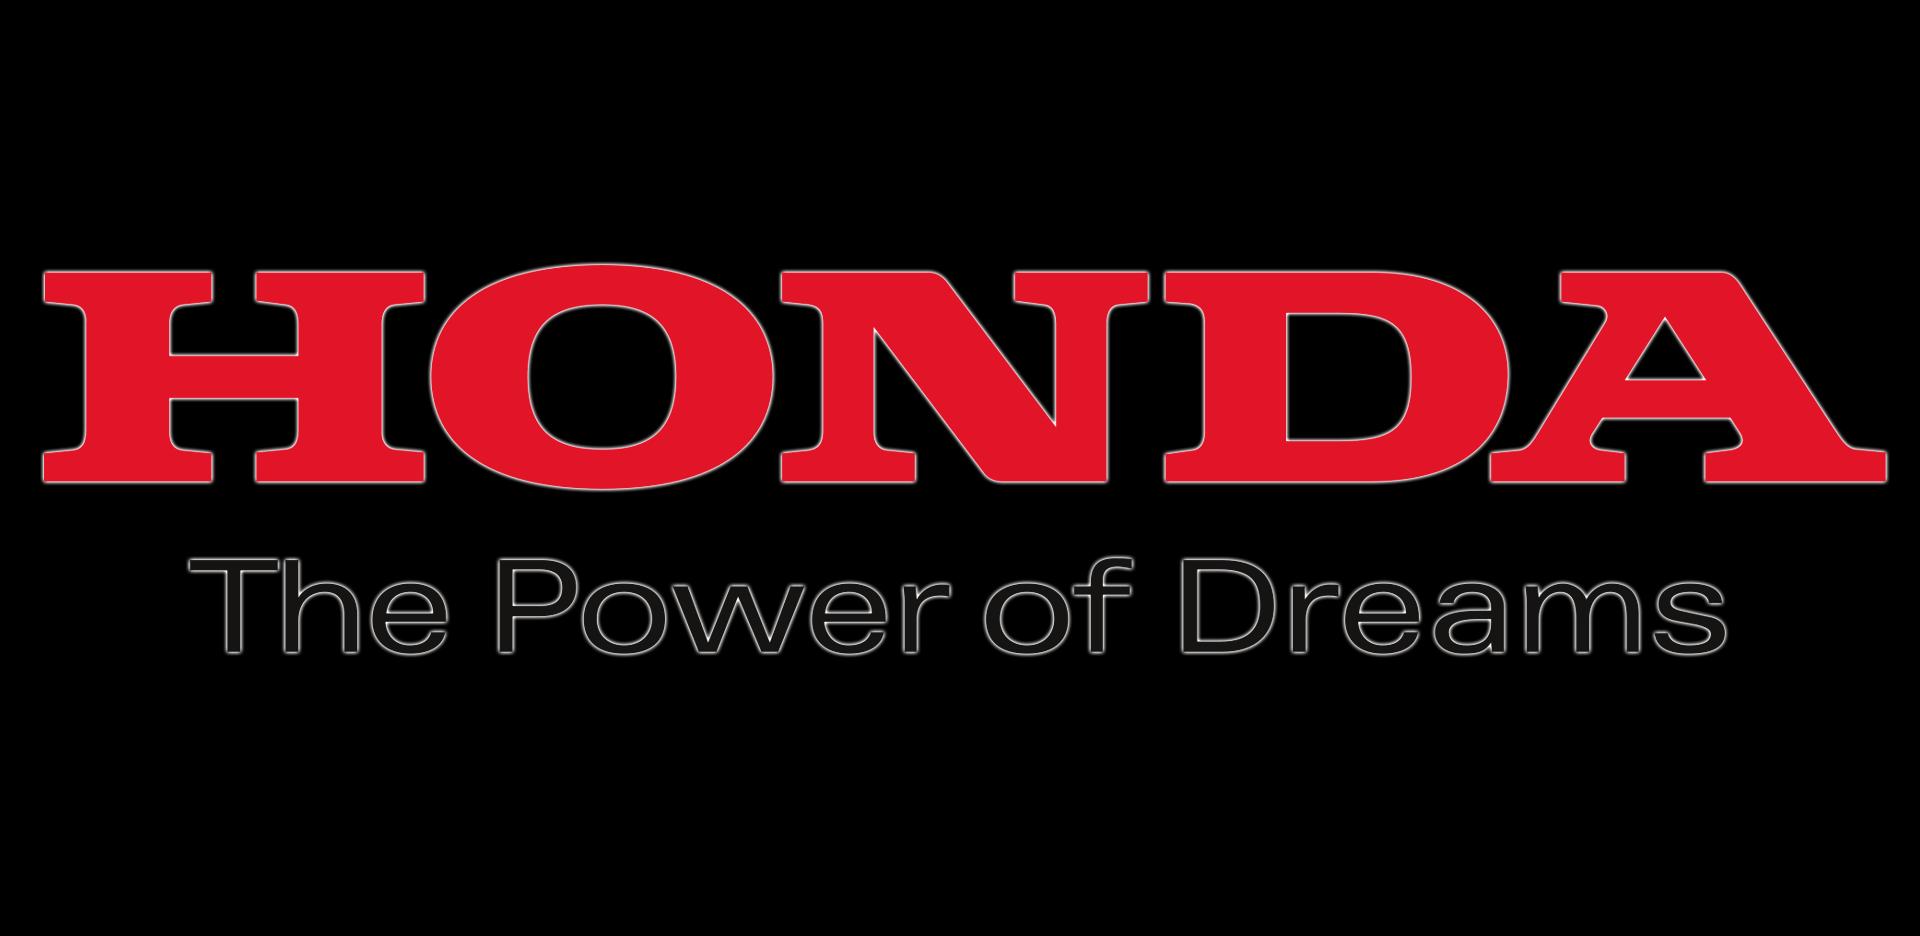 Wallpaper For Phones Fall Honda Logo Hd Backgrounds Pixelstalk Net